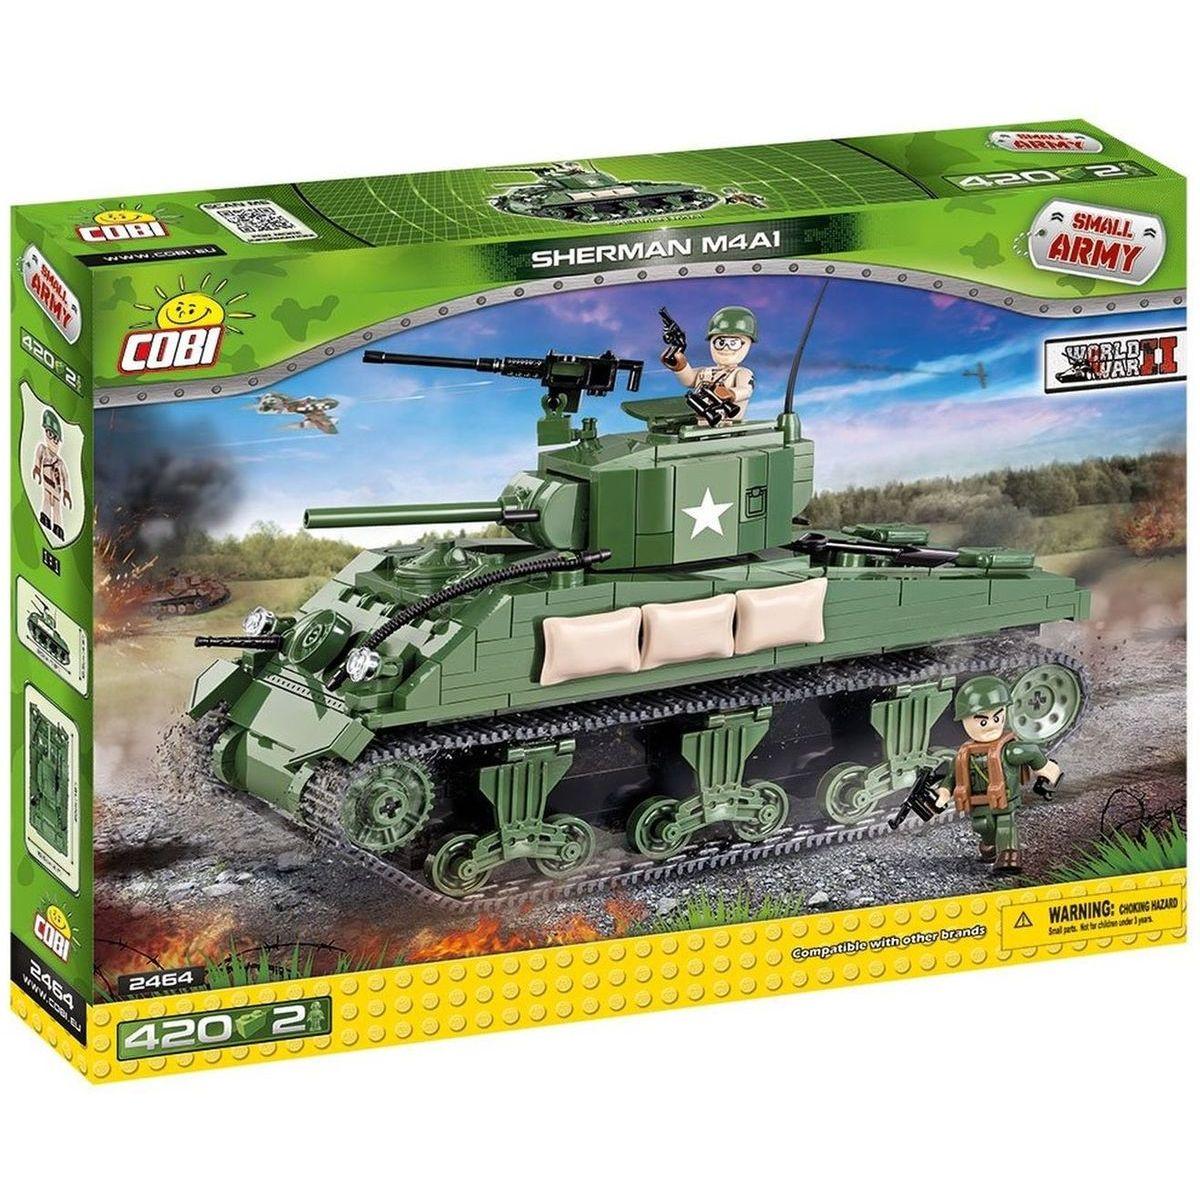 Cobi 2464 Small Army M4A1 Sherman